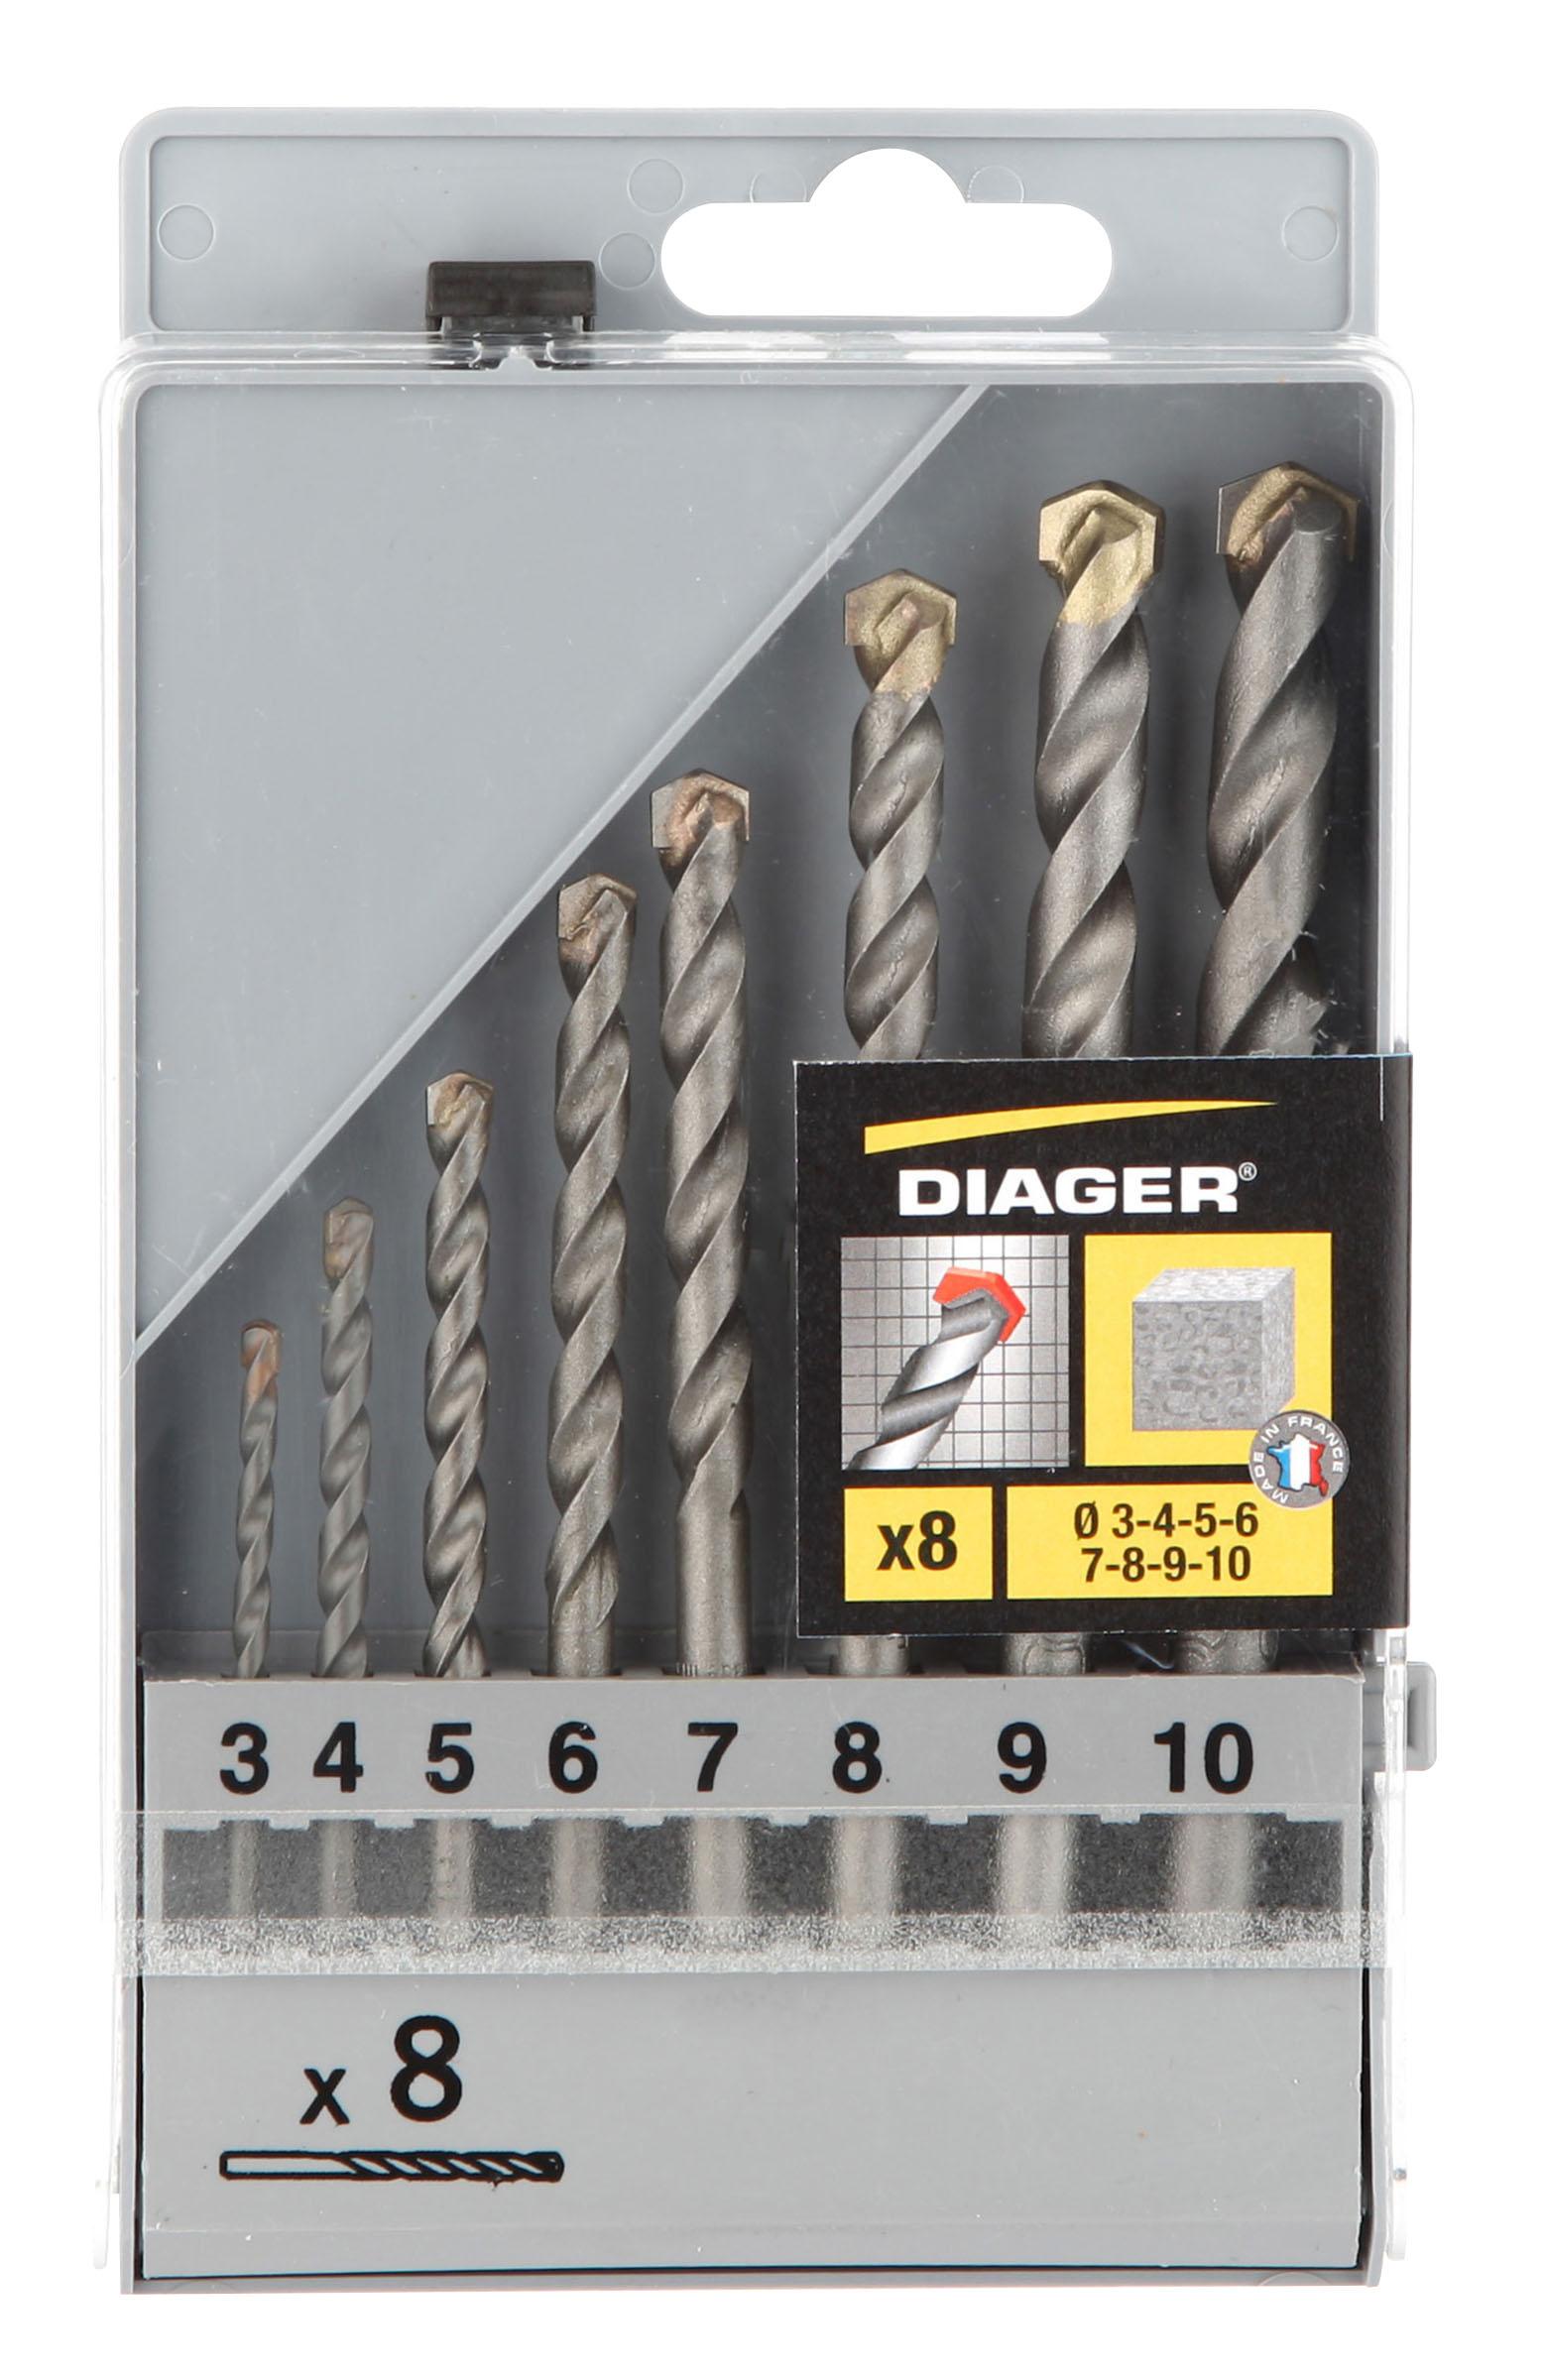 Perçage Flash Coff plast. 8pcs FLASH Ø3-4-5-6-7-8-9-10 - 250C.jpg